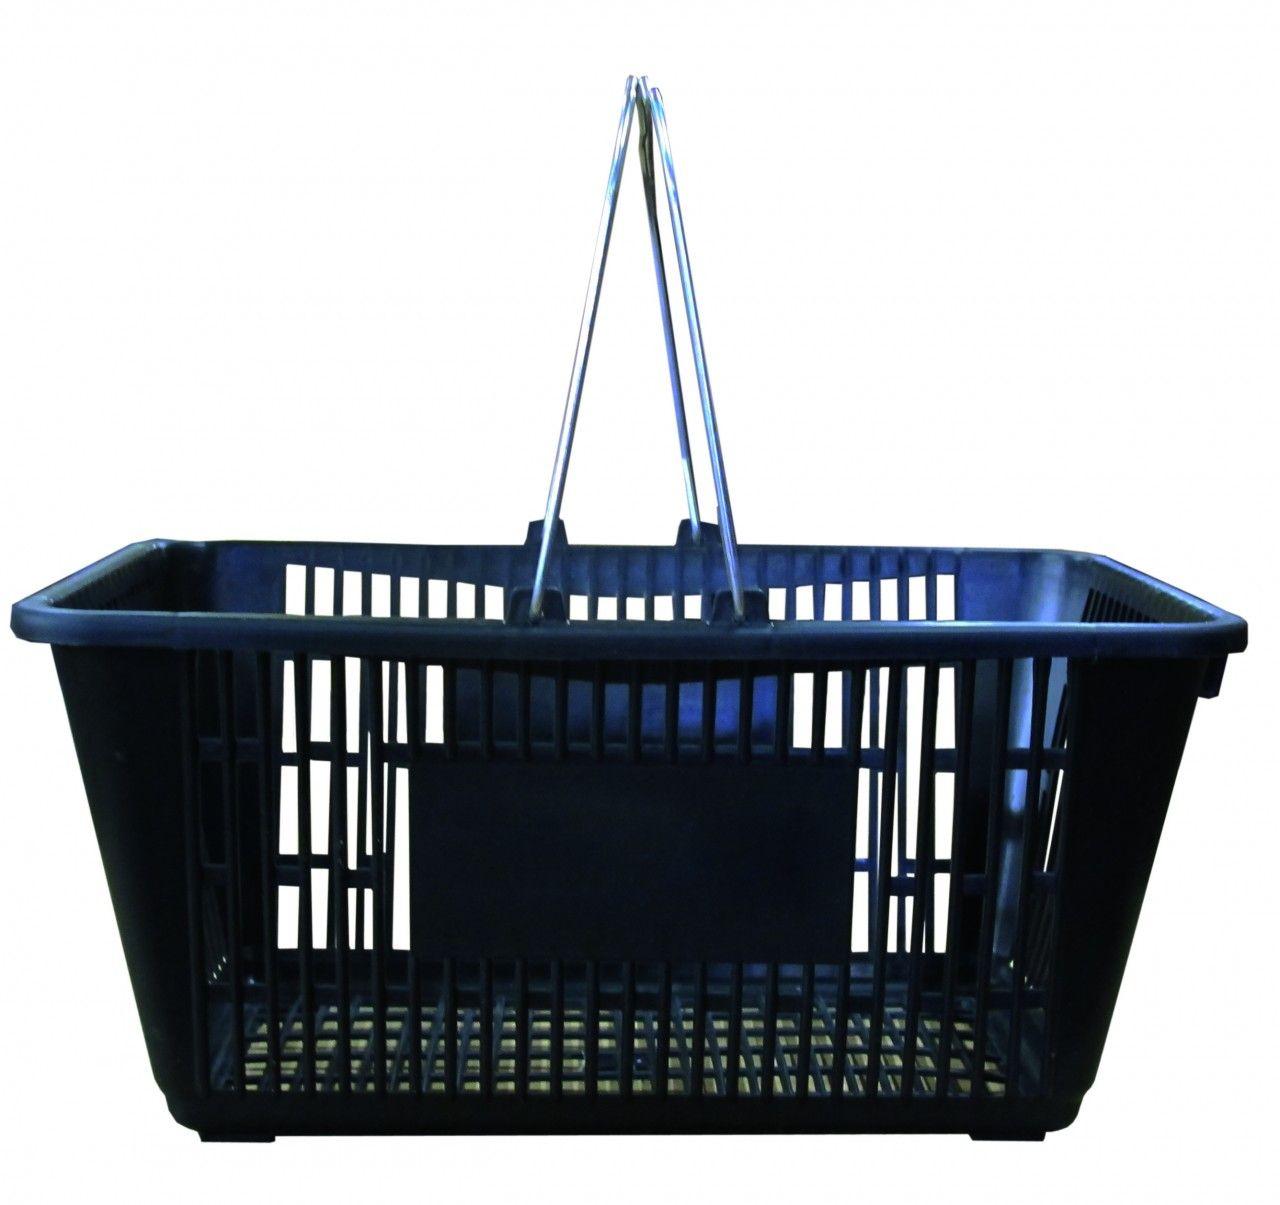 Retail Display Signs Offers A Huge Range Of Basket Like Dump